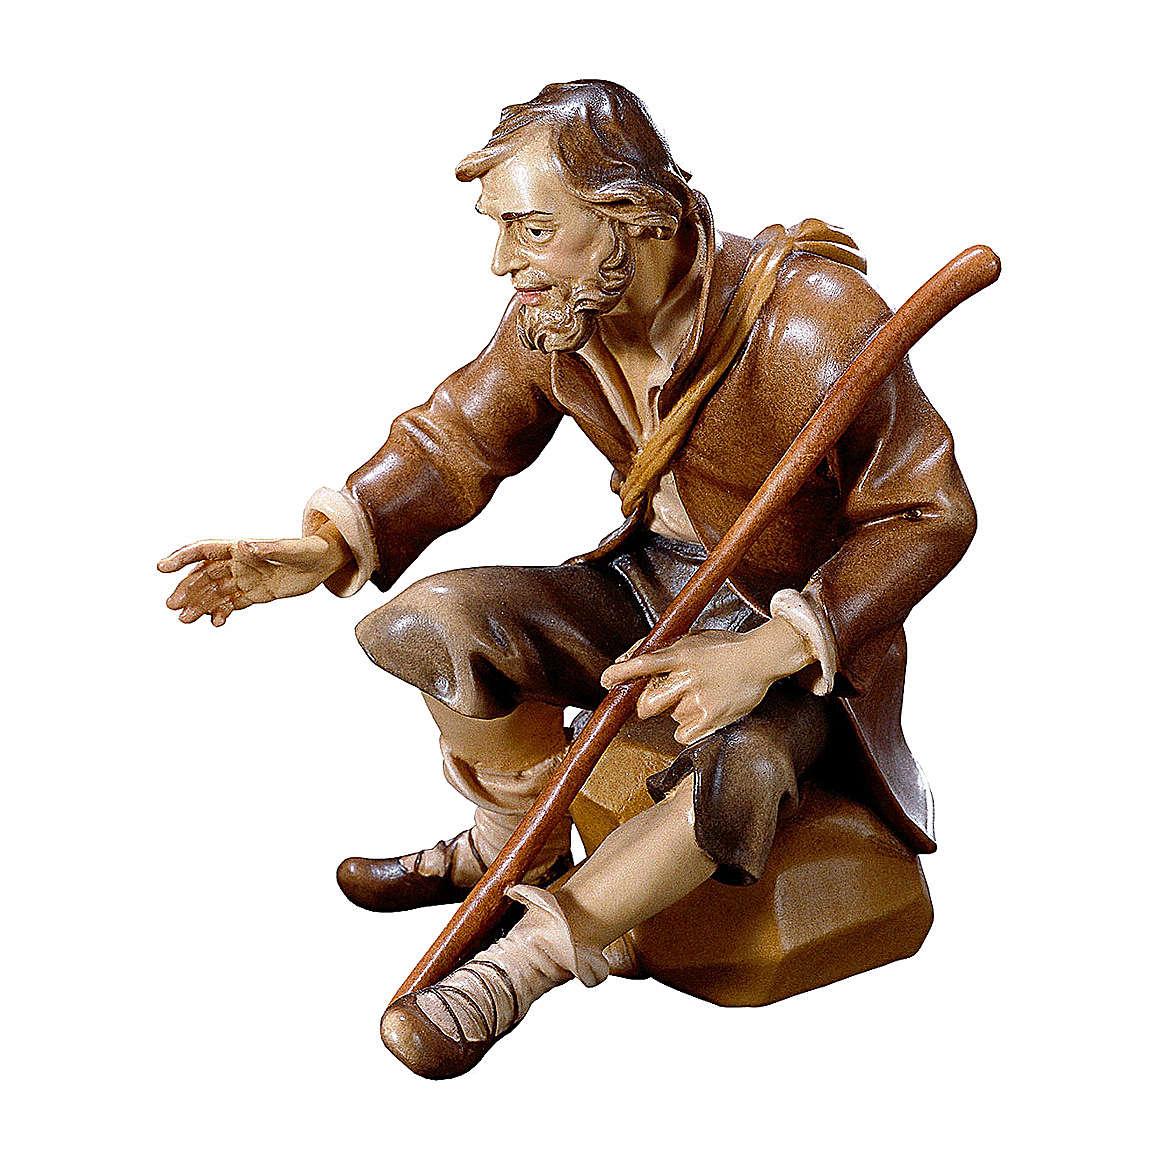 Pastore seduto con bastone per presepe Original Pastore legno dipinto in Valgardena 10 cm 4